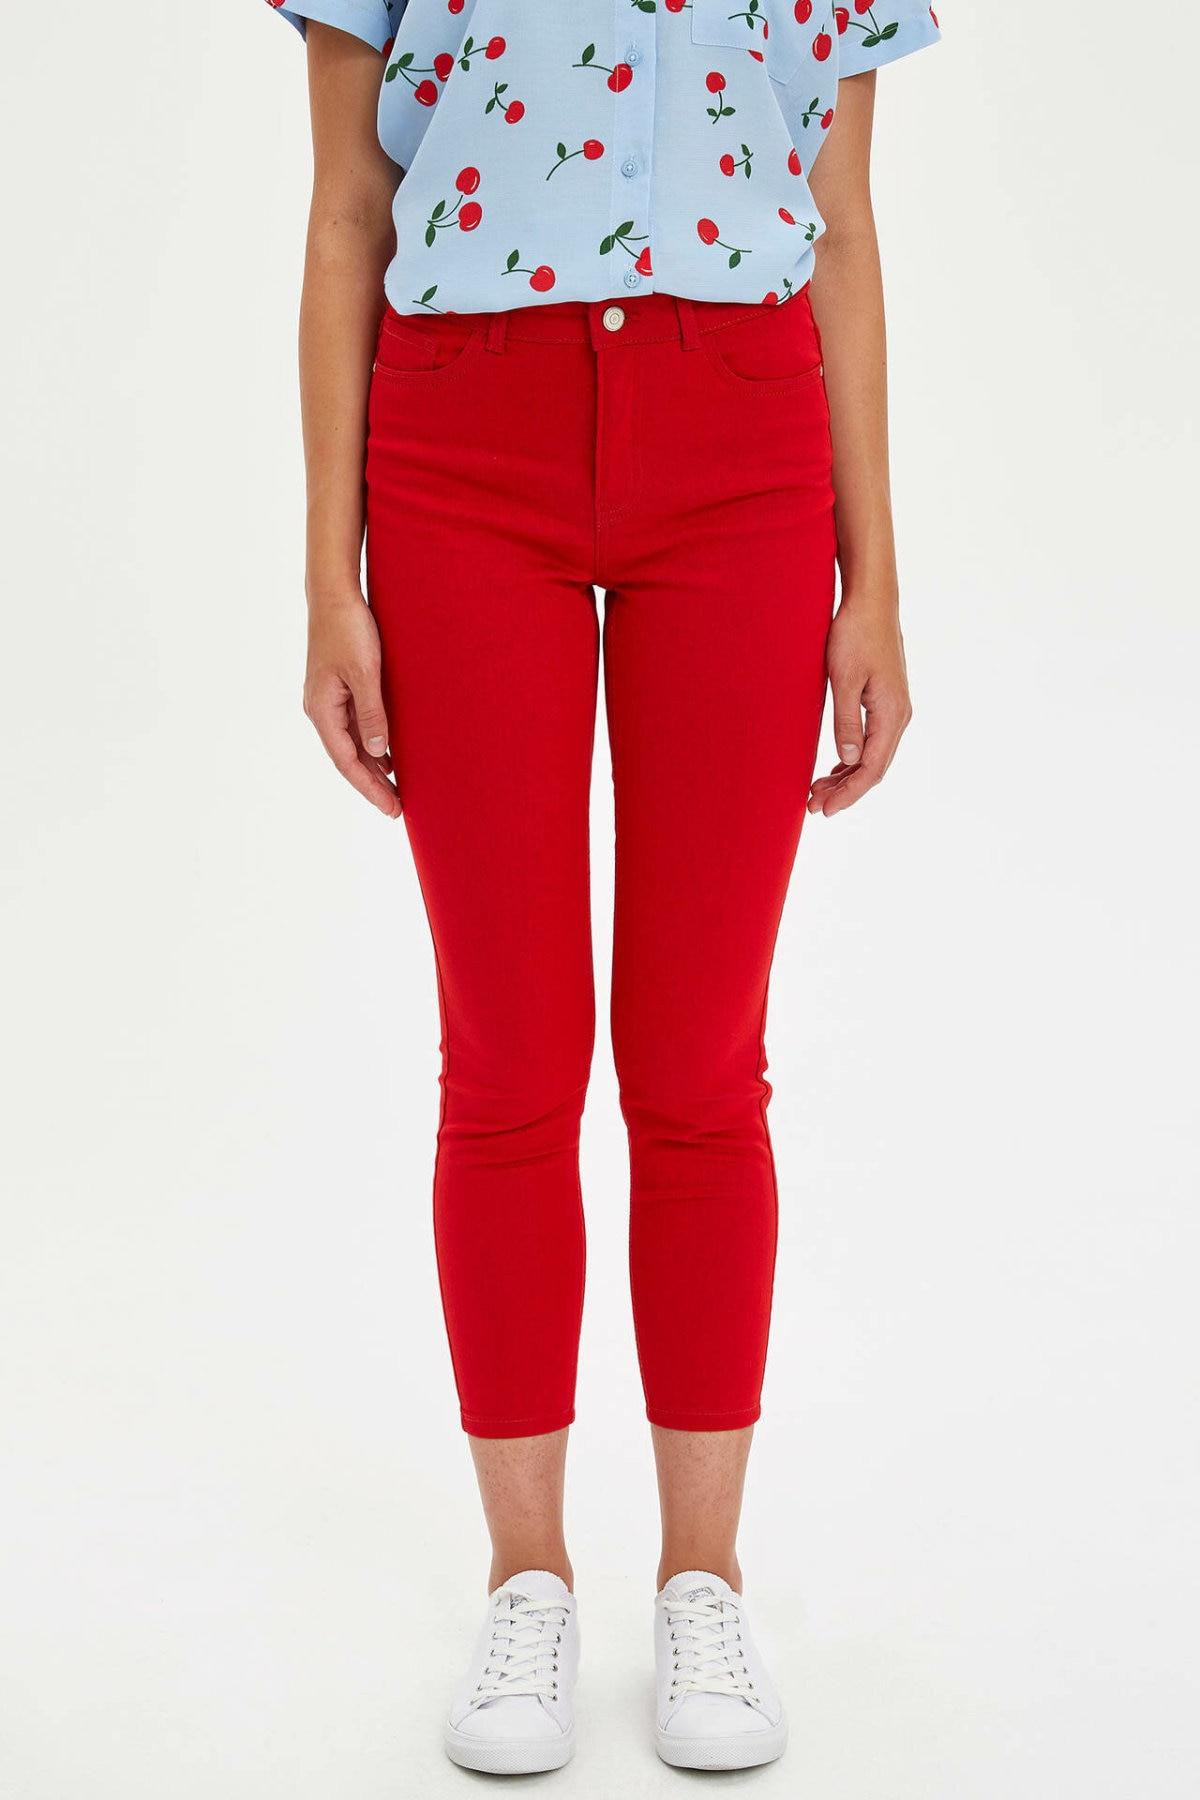 DeFacto Woman Red Skinny Pencil Pants Women Mid-waist Ninth Pants Female Casual Slim Trousers-L5558AZ19HS